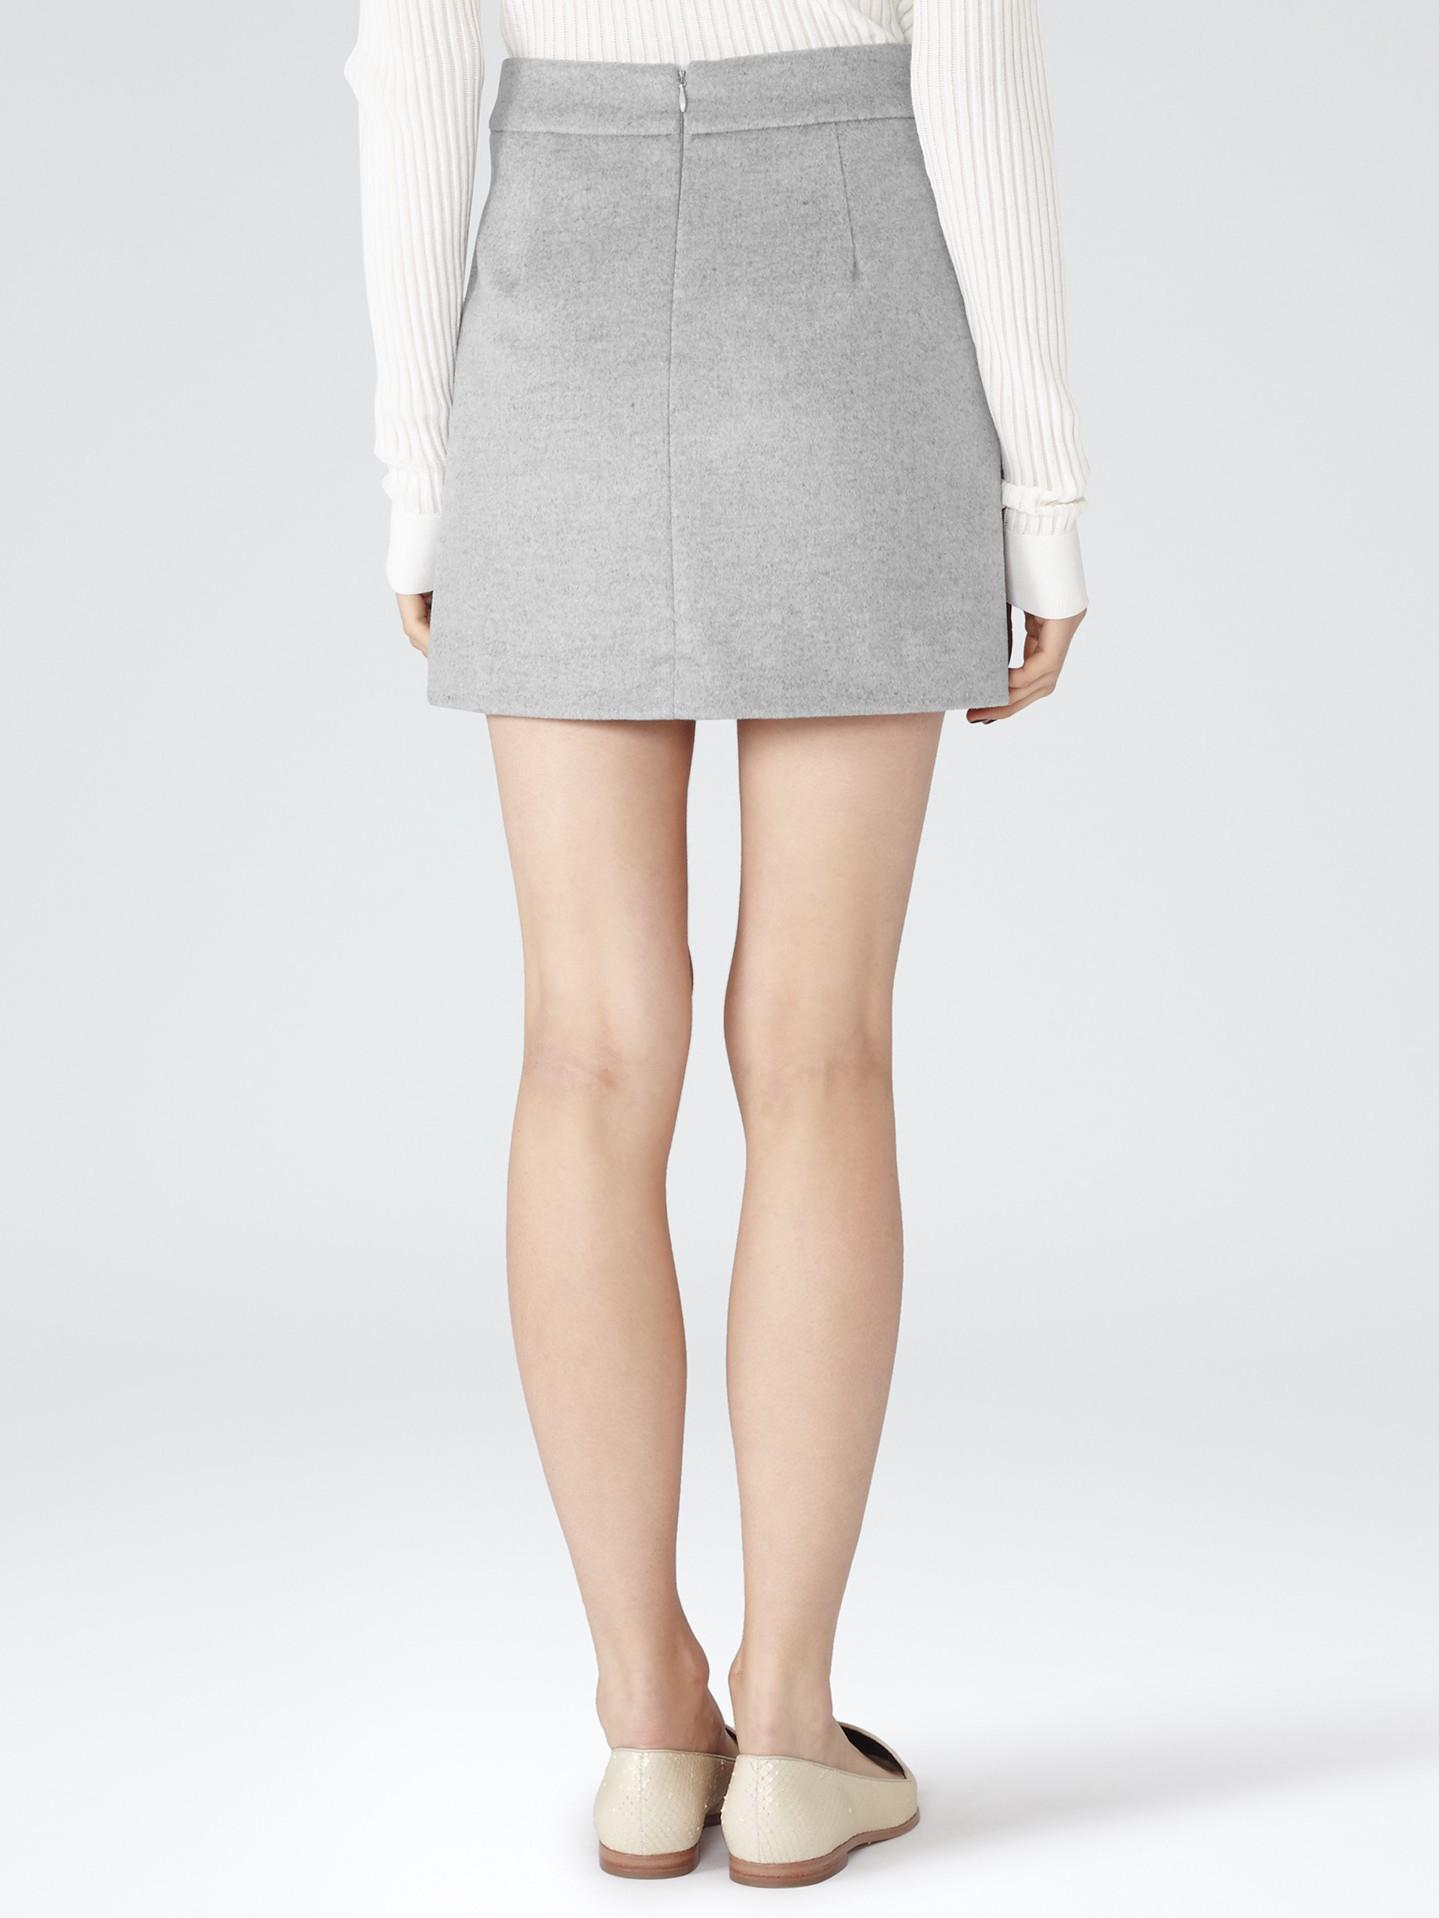 Reiss Wool Tokyo A-line Mini Skirt in Gray | Lyst